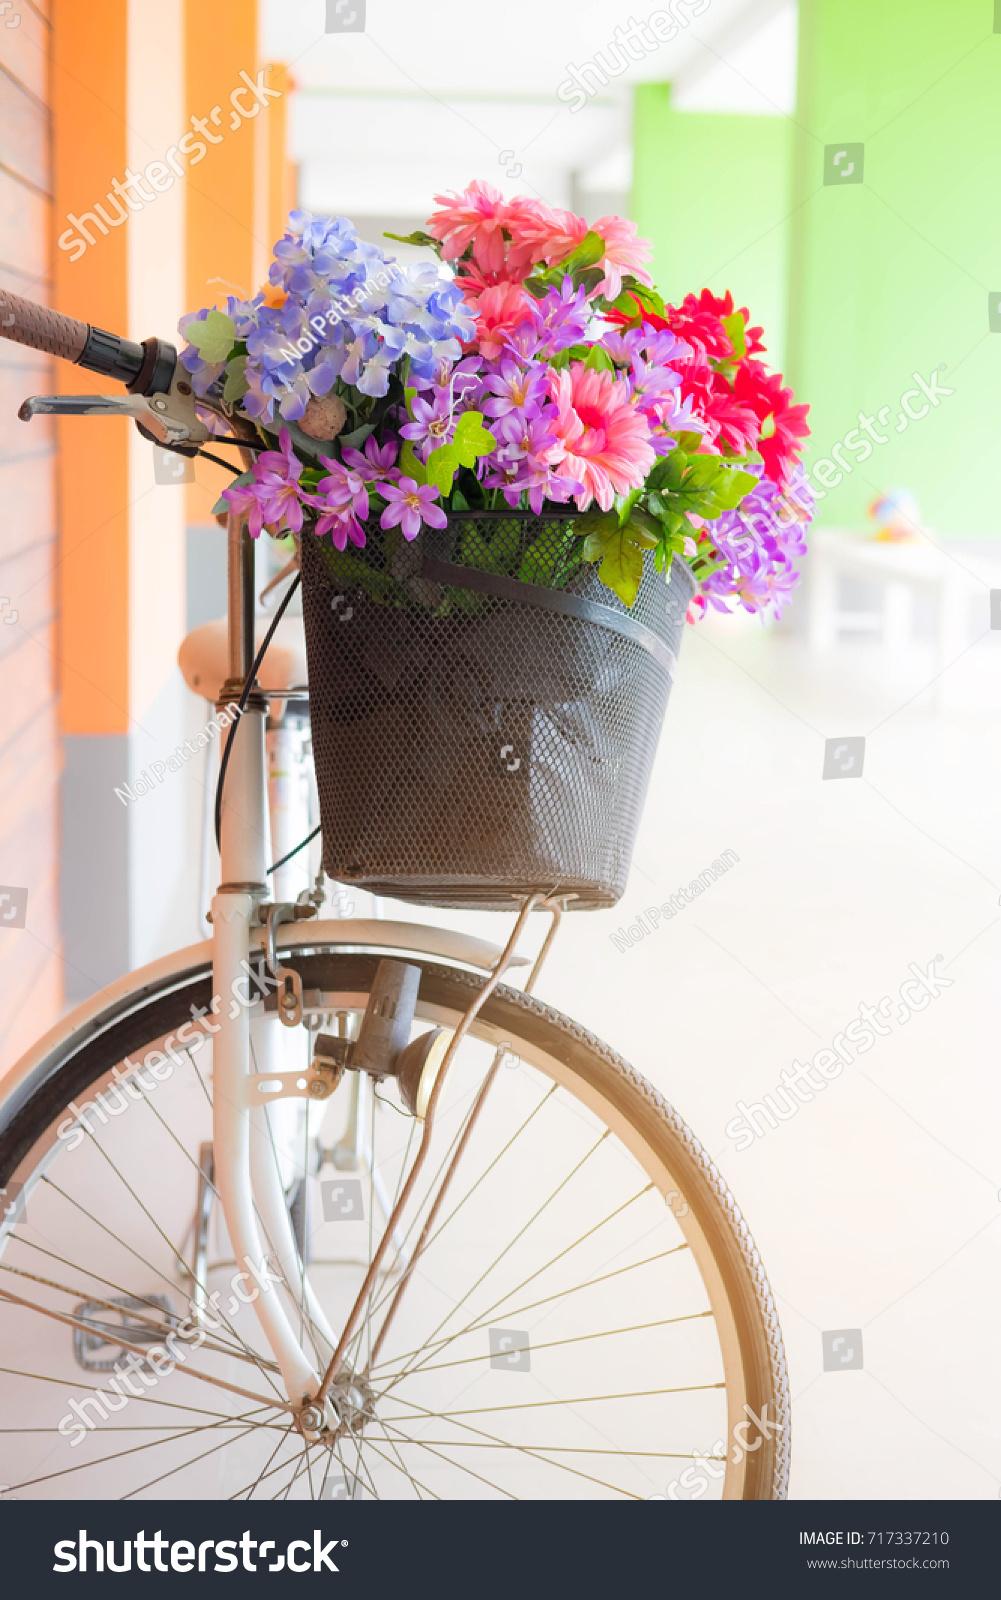 Famous beautiful fake flowers photos images for wedding gown ideas beautiful fake flowers basket old white stock photo 717337210 izmirmasajfo Choice Image